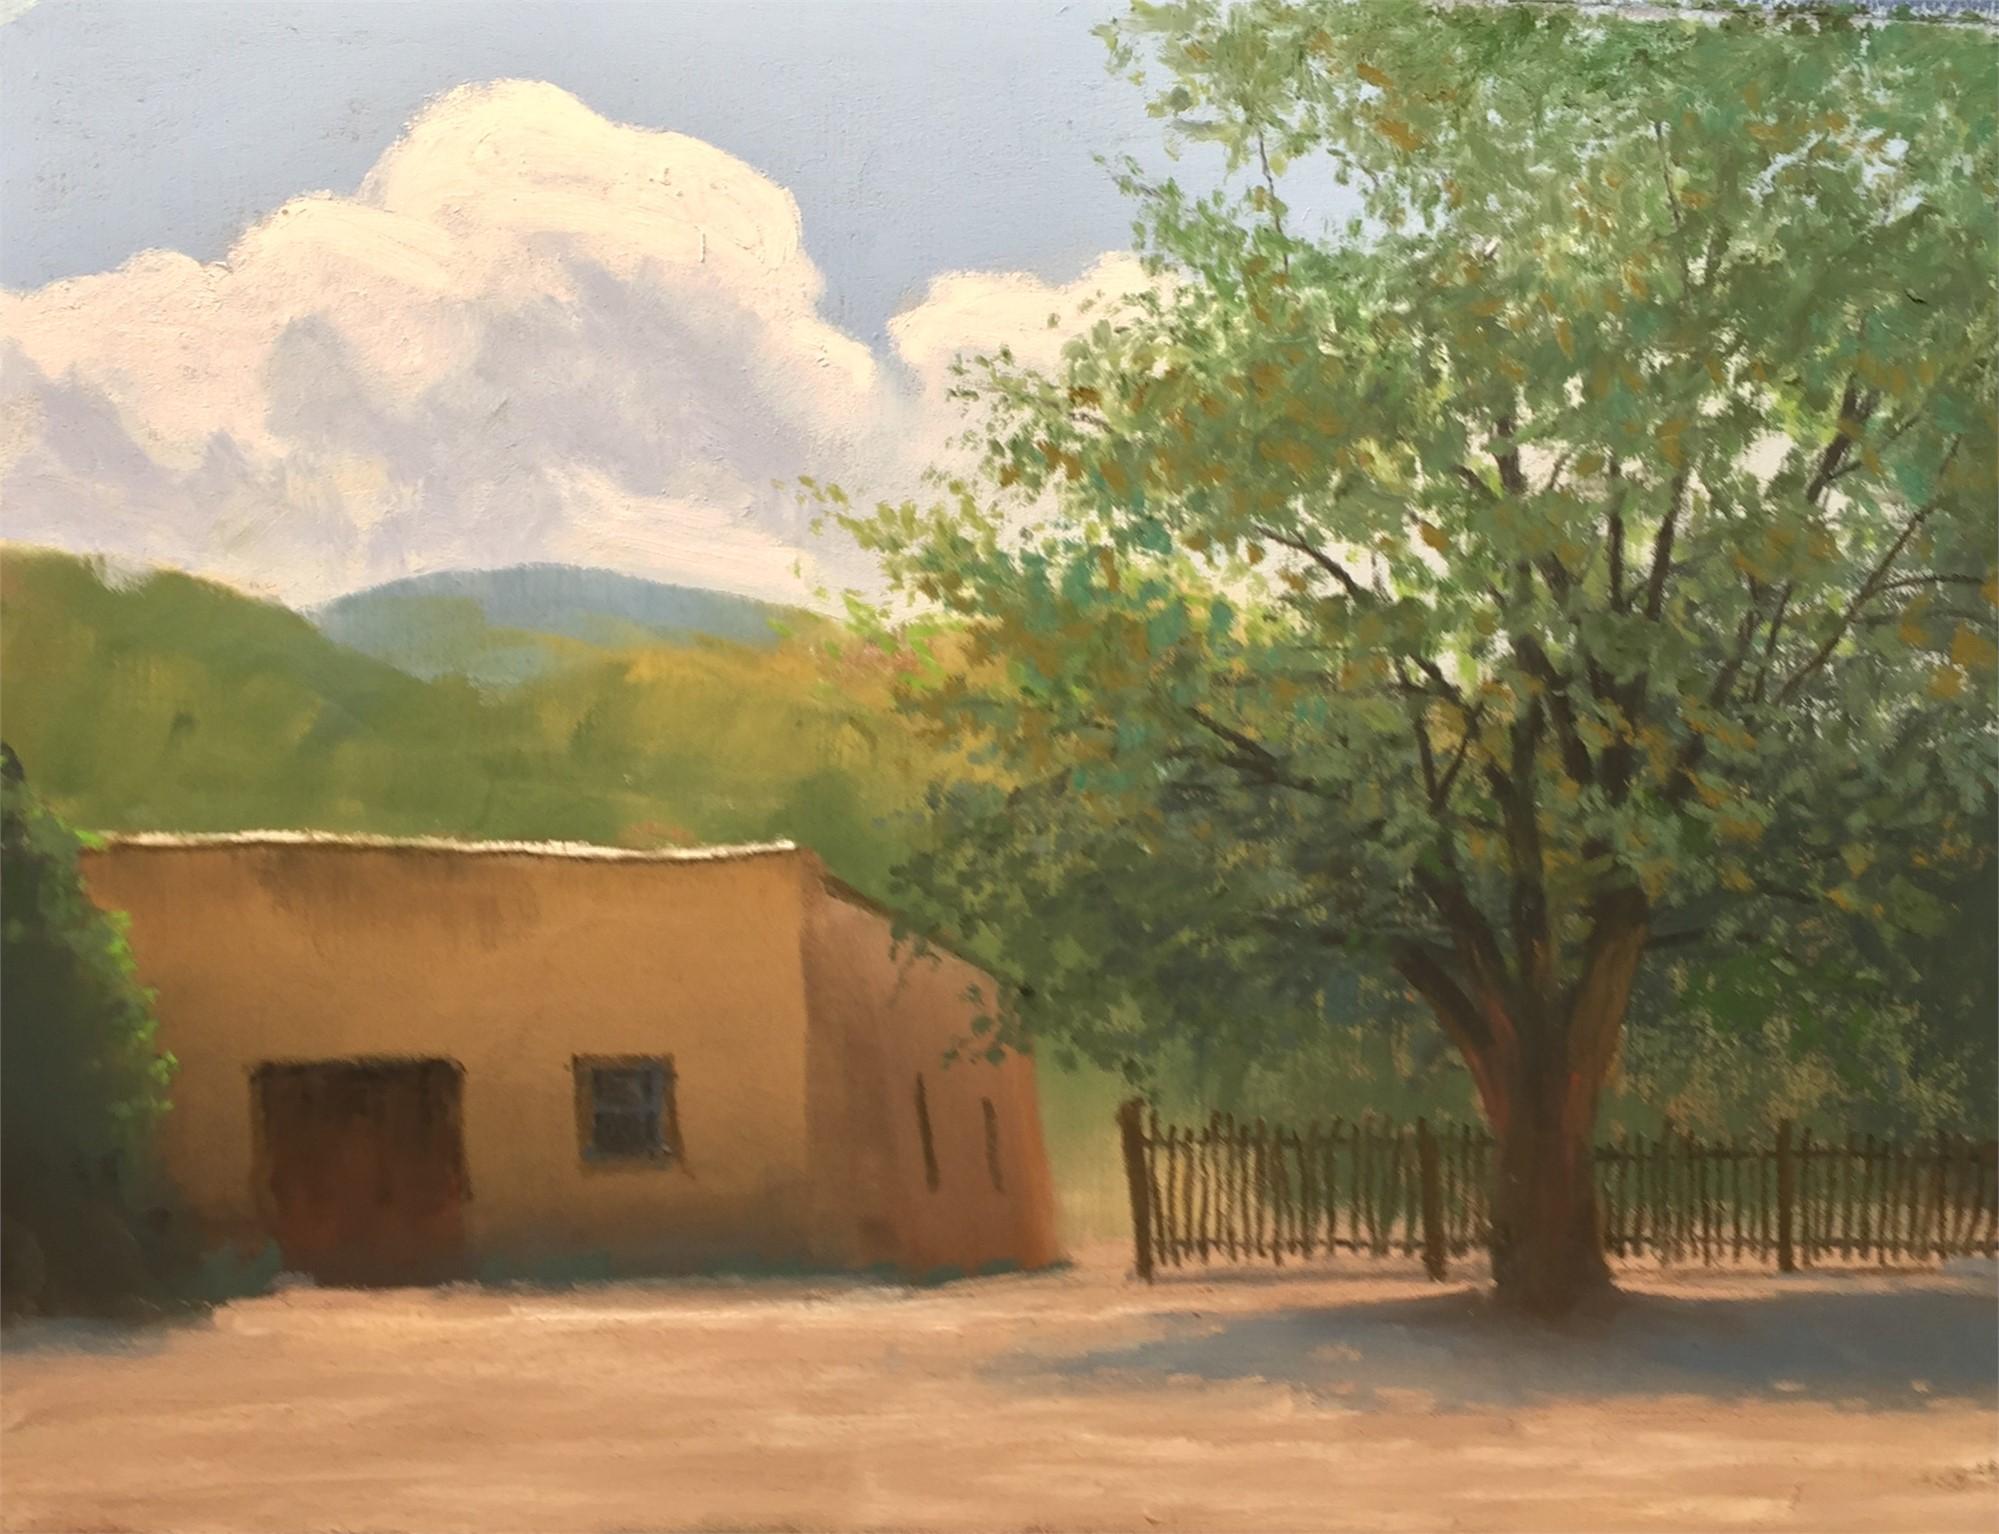 Church Yard by John Roush